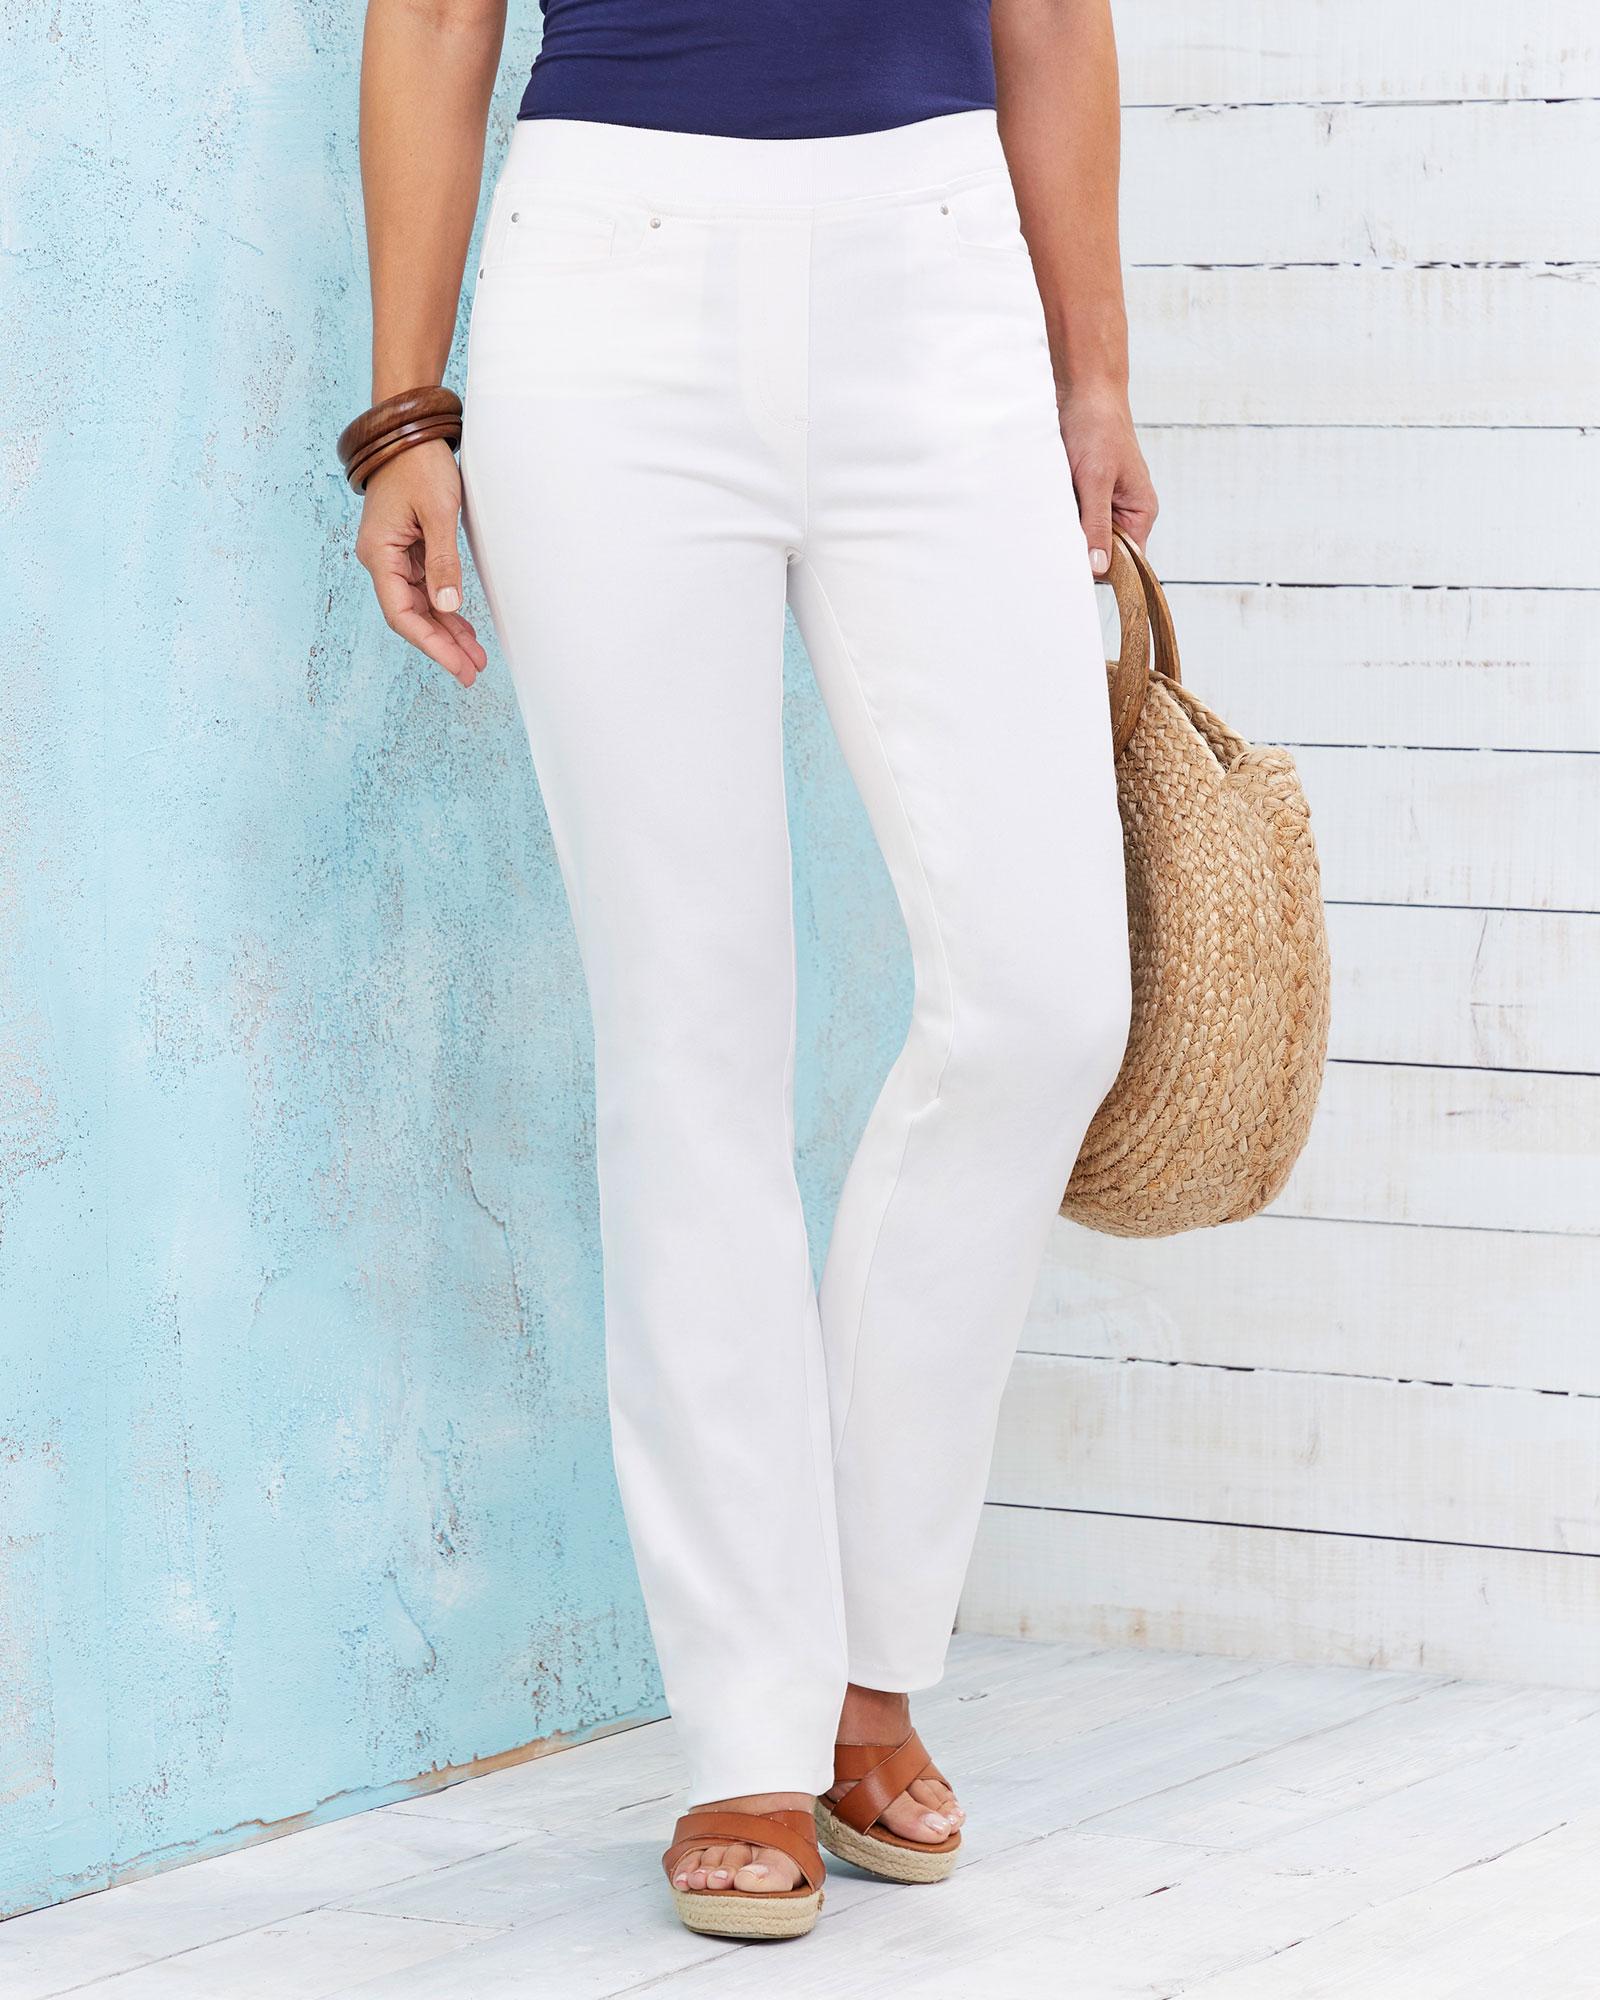 Premium Pull-on Rib Waist Jeans at Cotton Traders 614979f7ecae